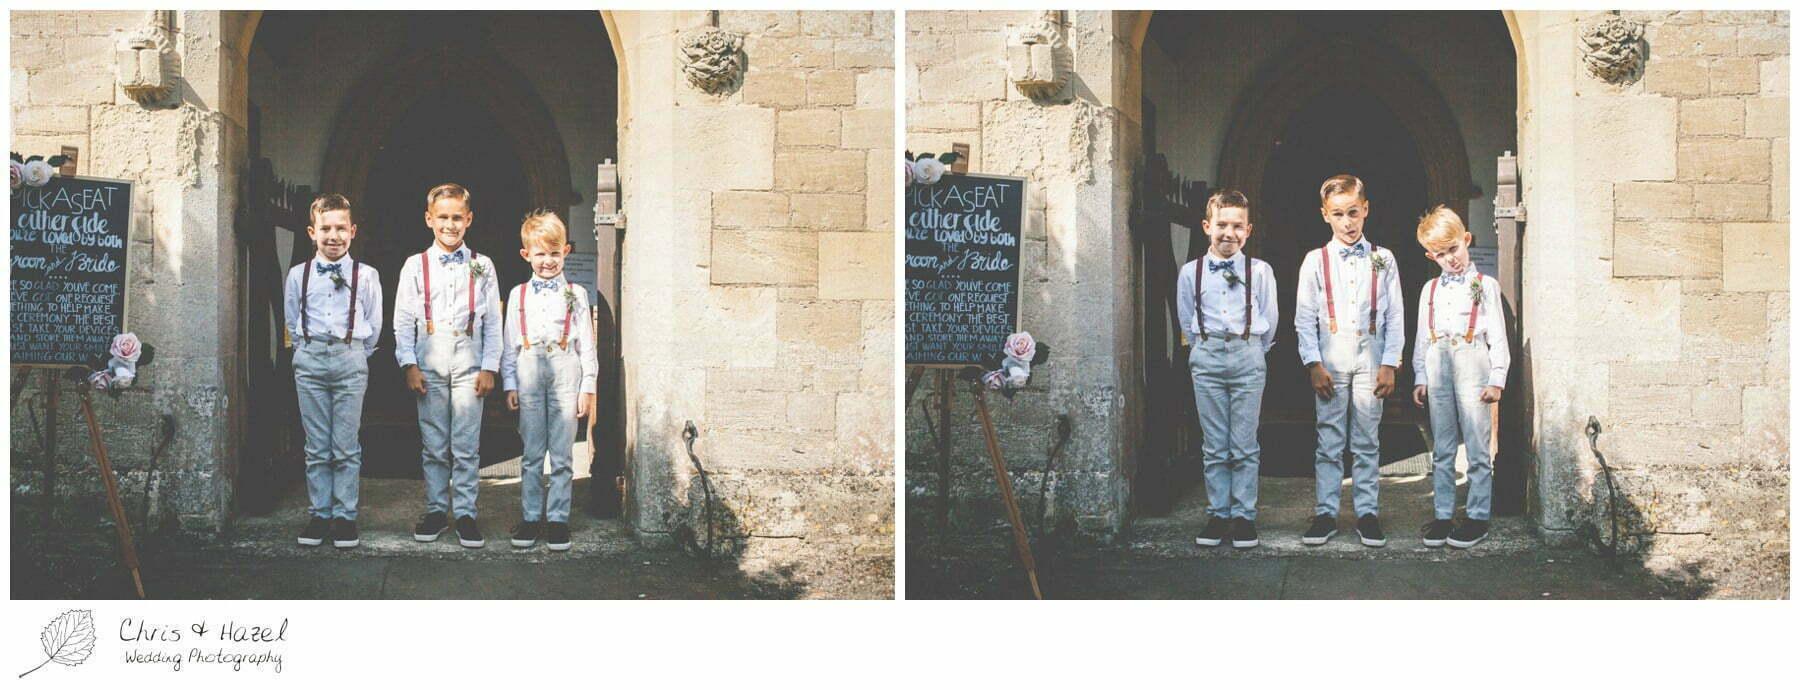 Page boys Hilperton Church, St Michael & All Angels' Church, Wedding Photography, Wiltshire Wedding Photographer Trowbridge, Chris and Hazel Wedding Photography